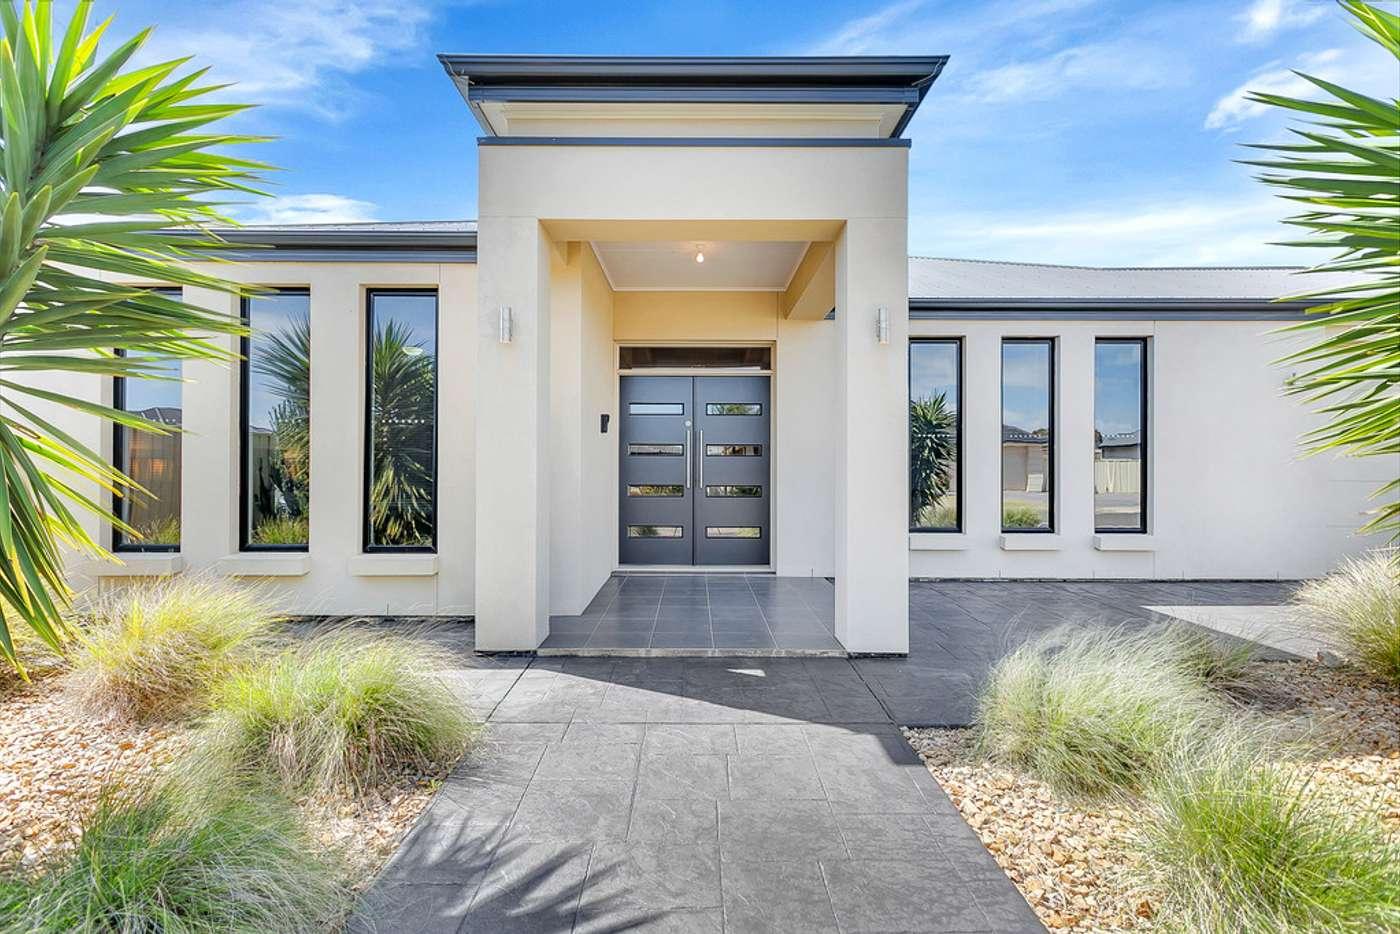 Main view of Homely house listing, 5 Toucan Loop, Aldinga Beach SA 5173